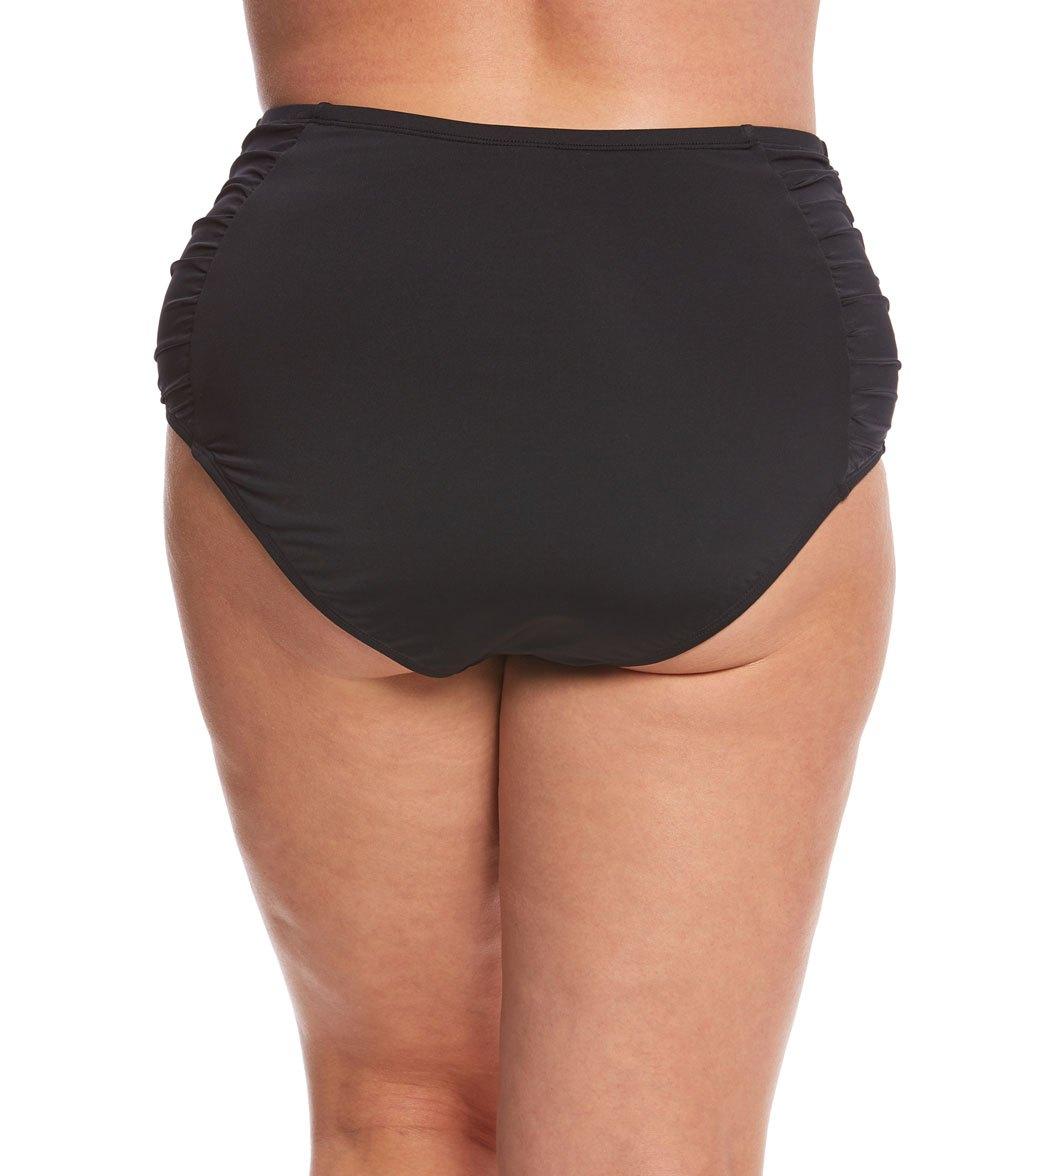 59c50a2d8e4 Jantzen Plus Size Solid High Waist Bikini Bottom at SwimOutlet.com ...